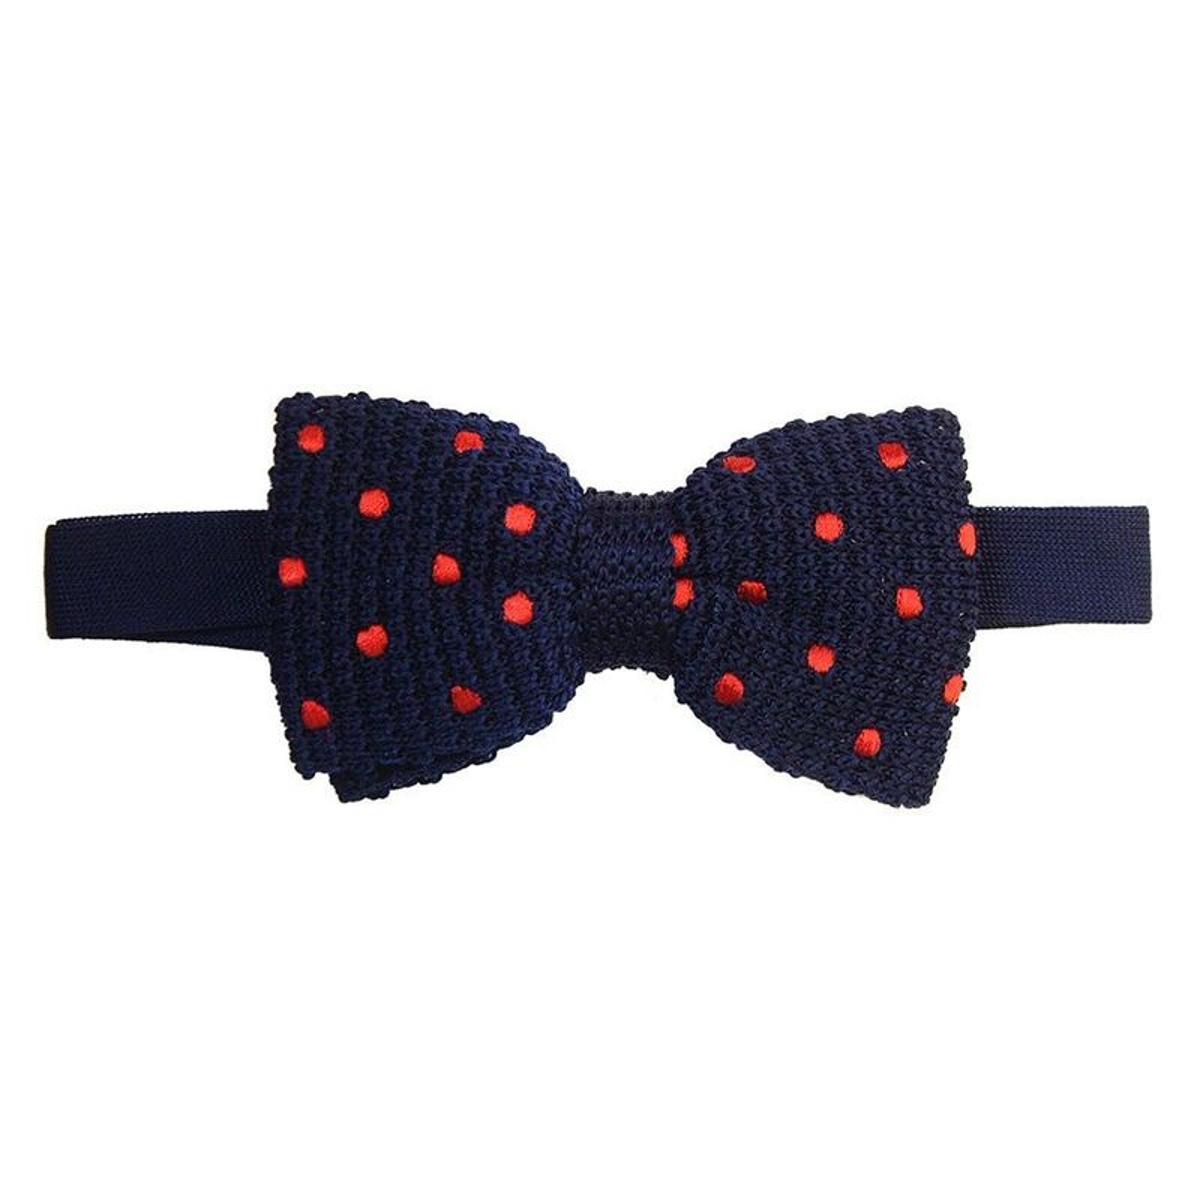 Noeud papillon tricot soie dandy style